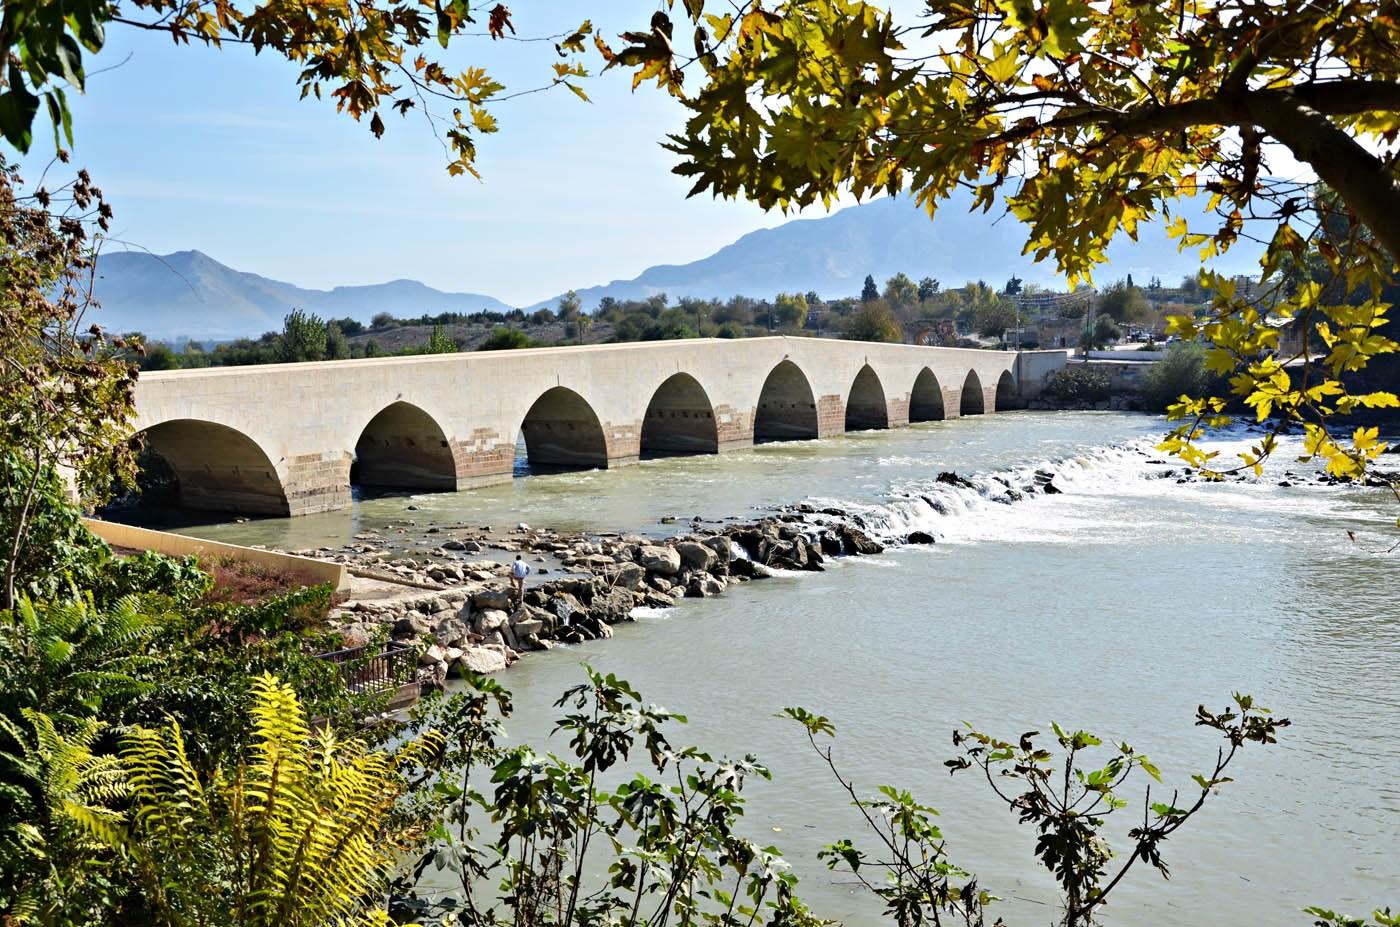 Misis Antik Kenti_Misis Köprüsü